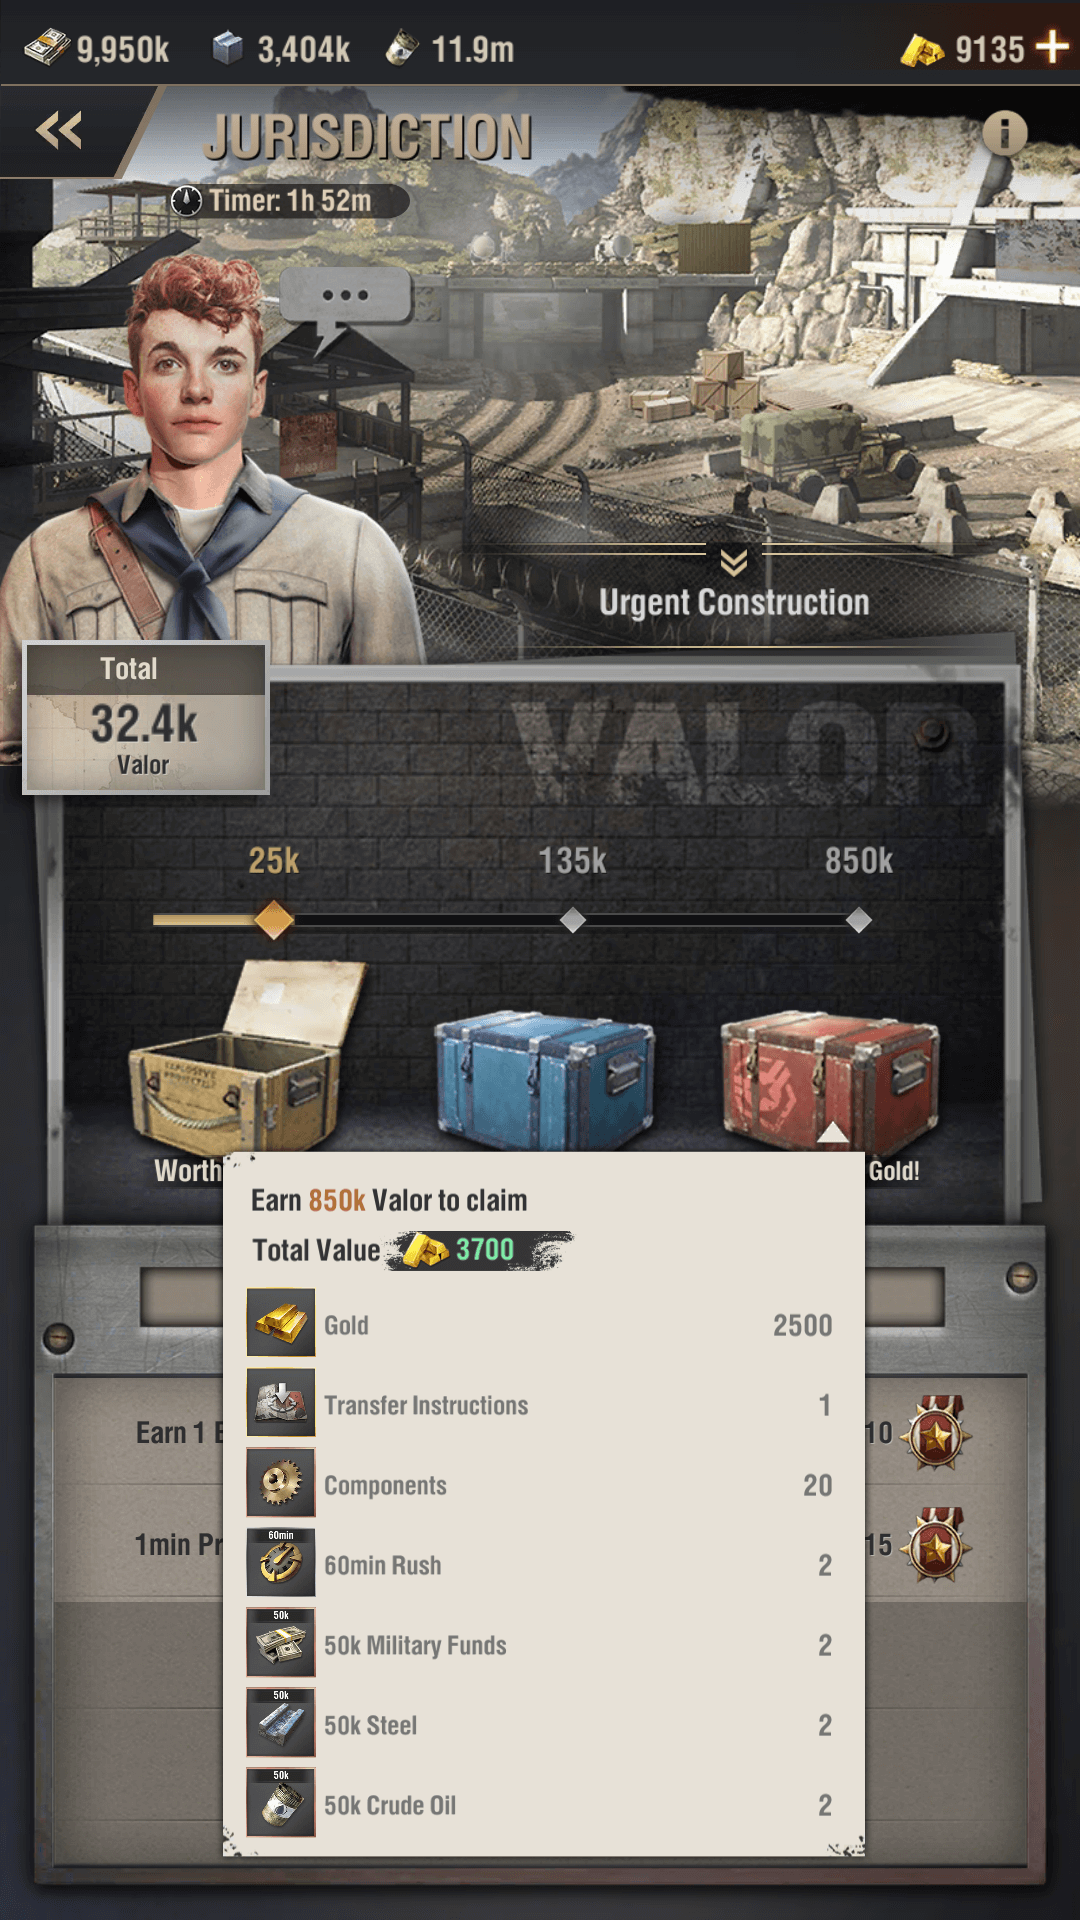 event Jurisdiction warpath screenshot 2